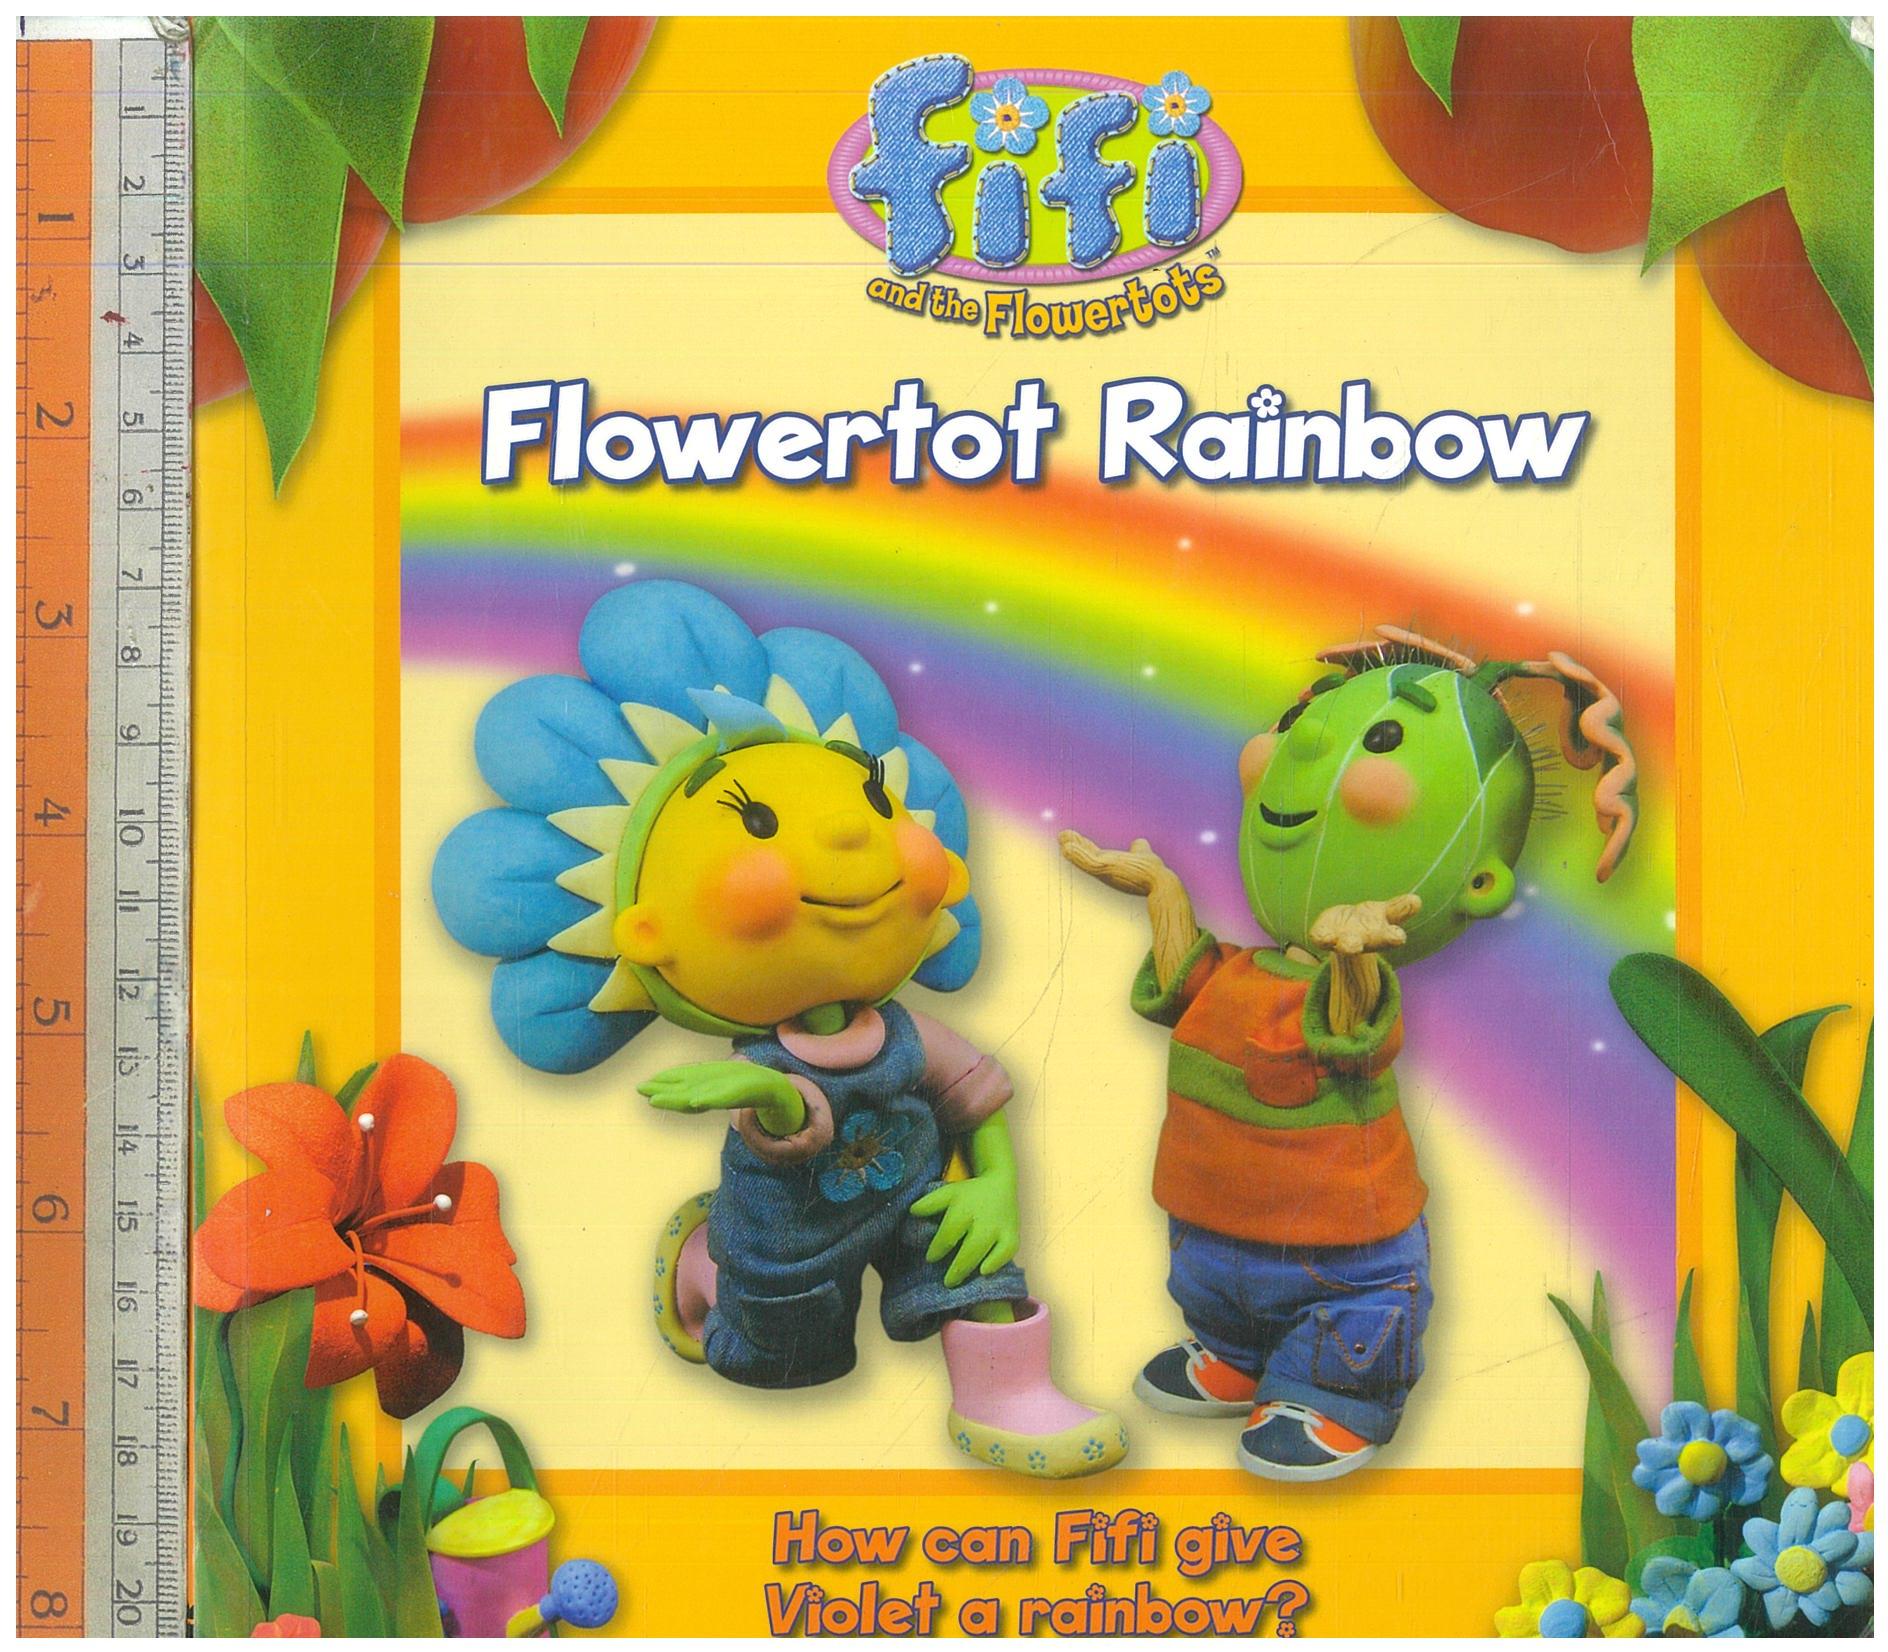 Flowertot Rainbow